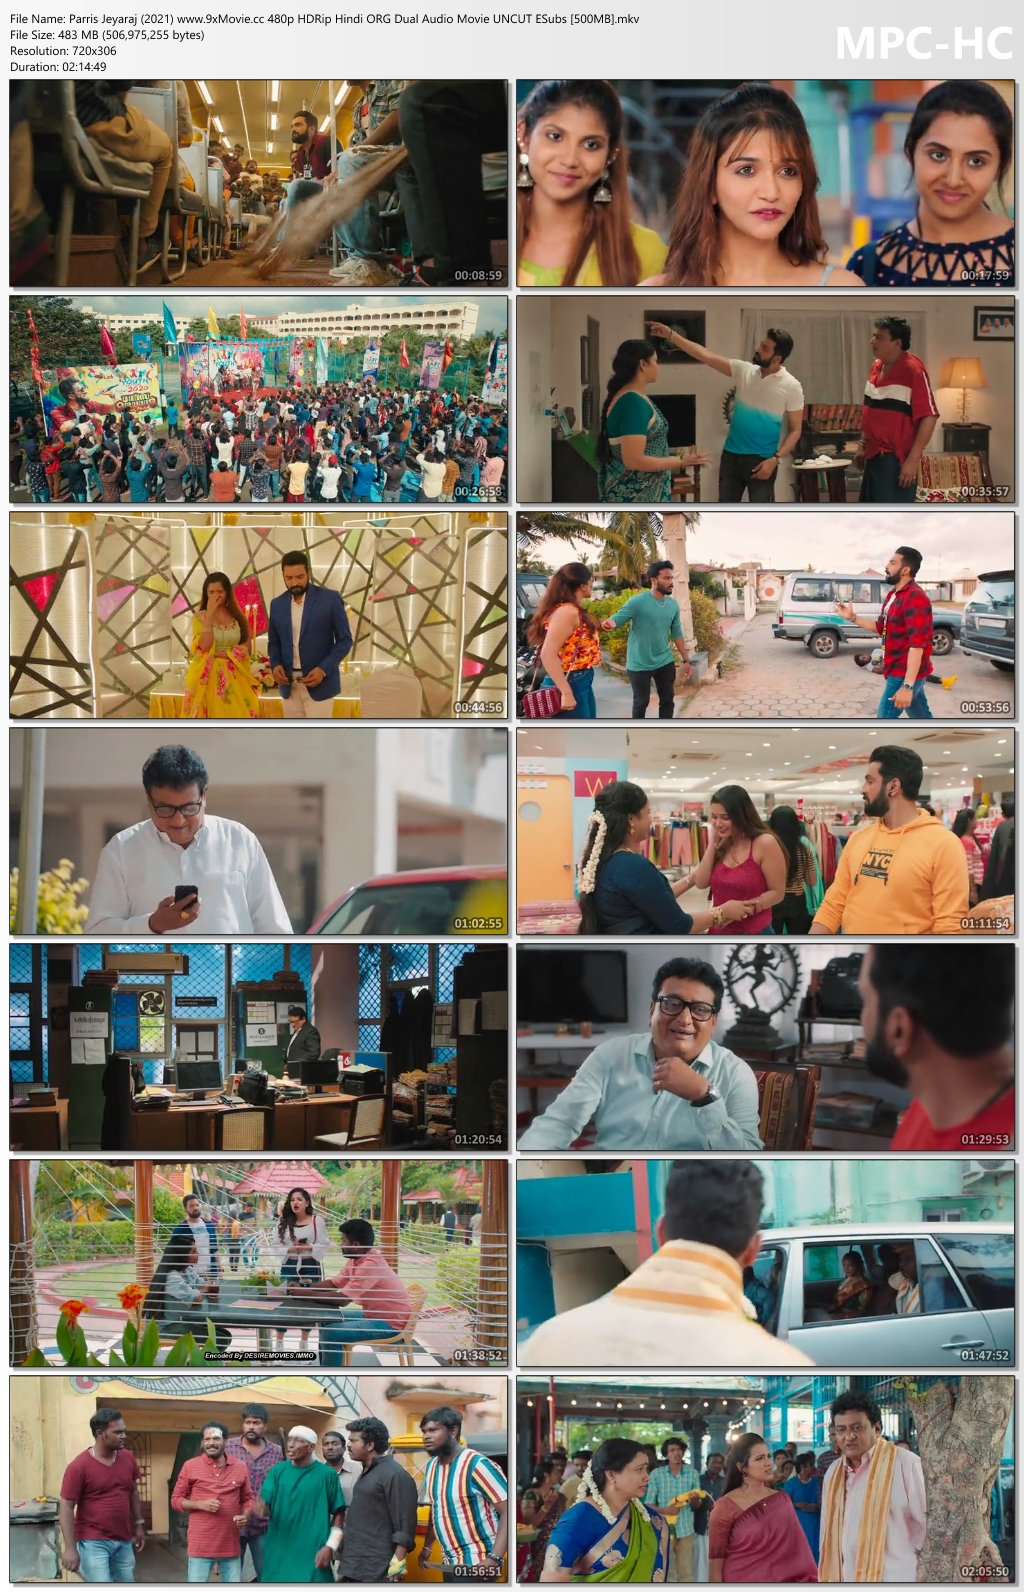 Parris-Jeyaraj-2021-www-9x-Movie-cc-480p-HDRip-Hindi-ORG-Dual-Audio-Movie-UNCUT-ESubs-500-MB-mkv